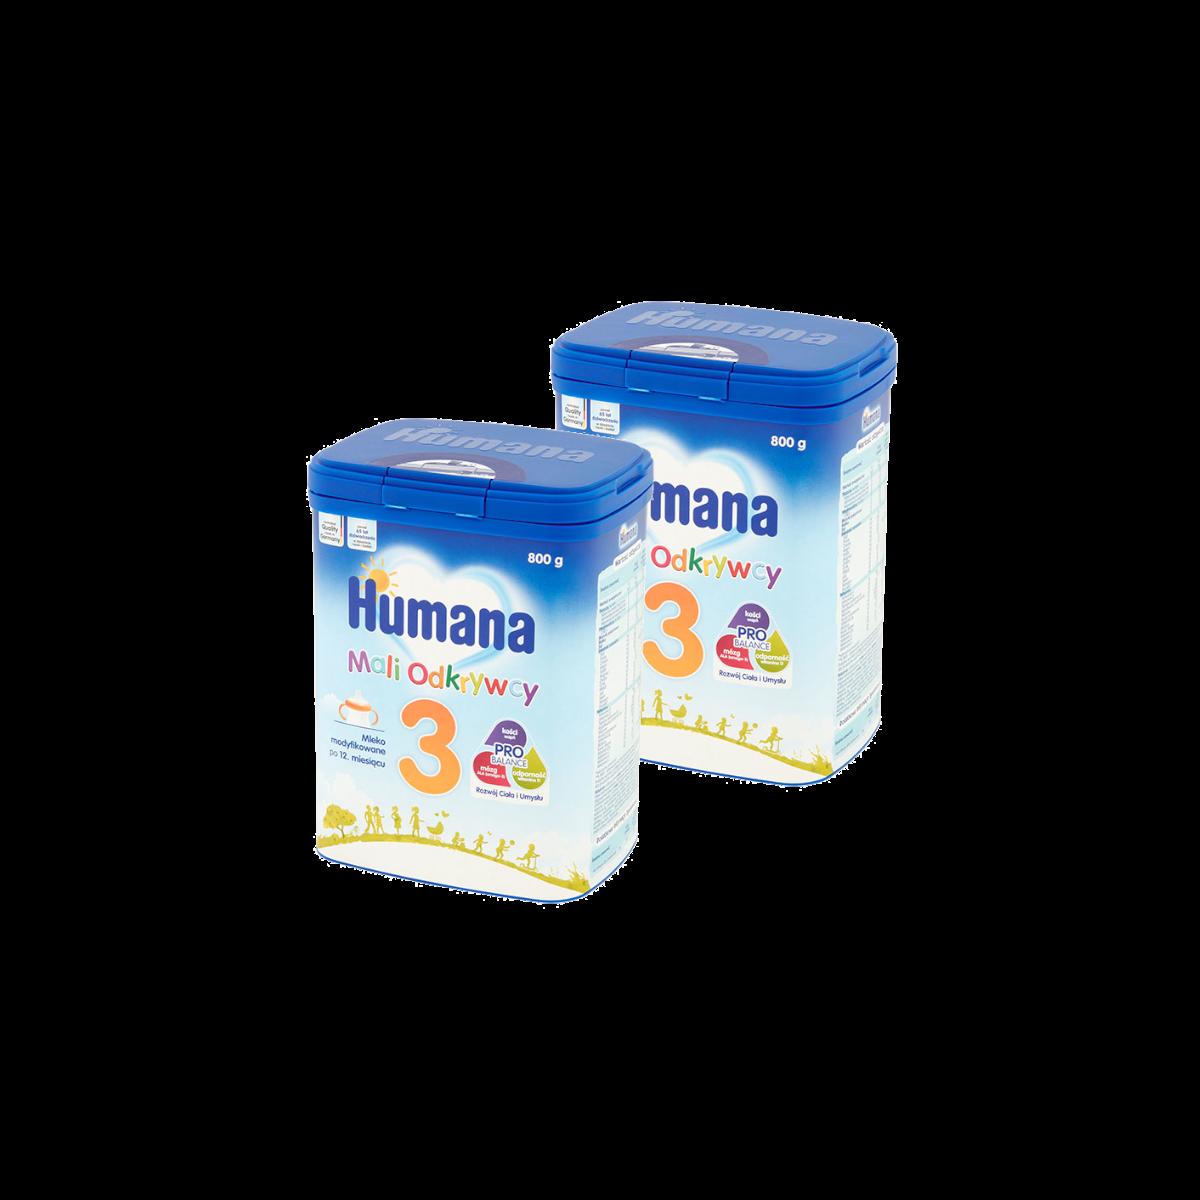 humana3_800_2pak